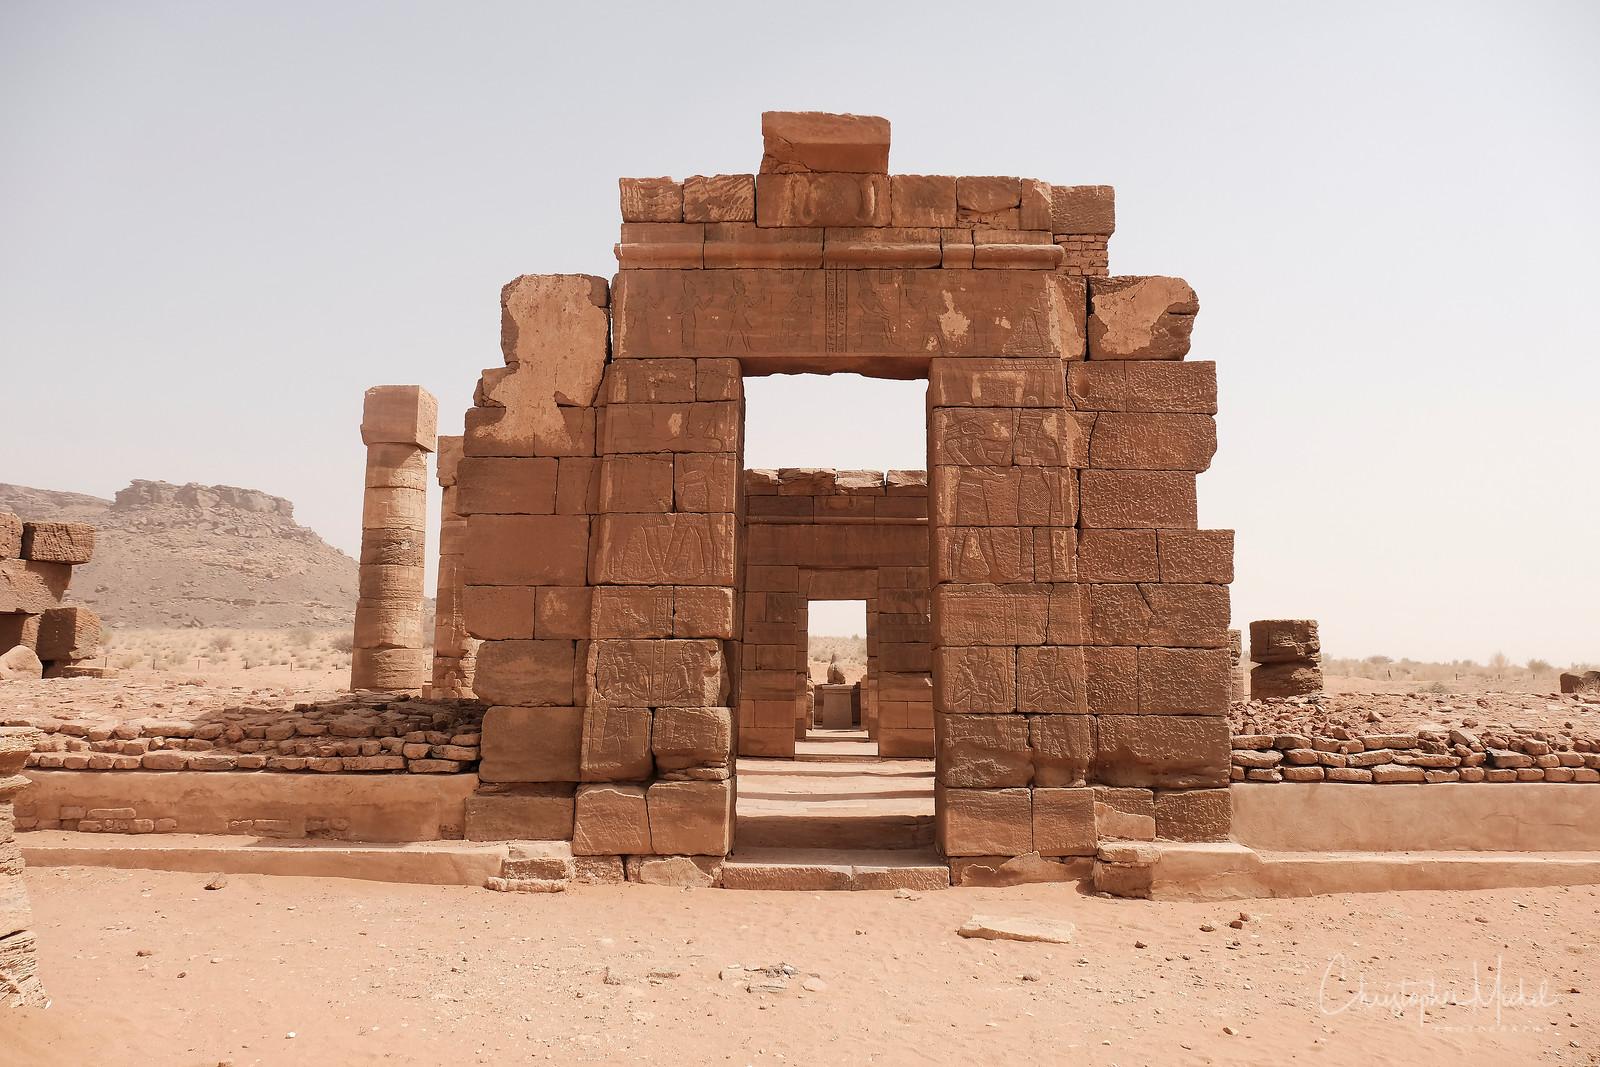 Meroitic Temple of Amun.  https://en.wikipedia.org/wiki/Naqa